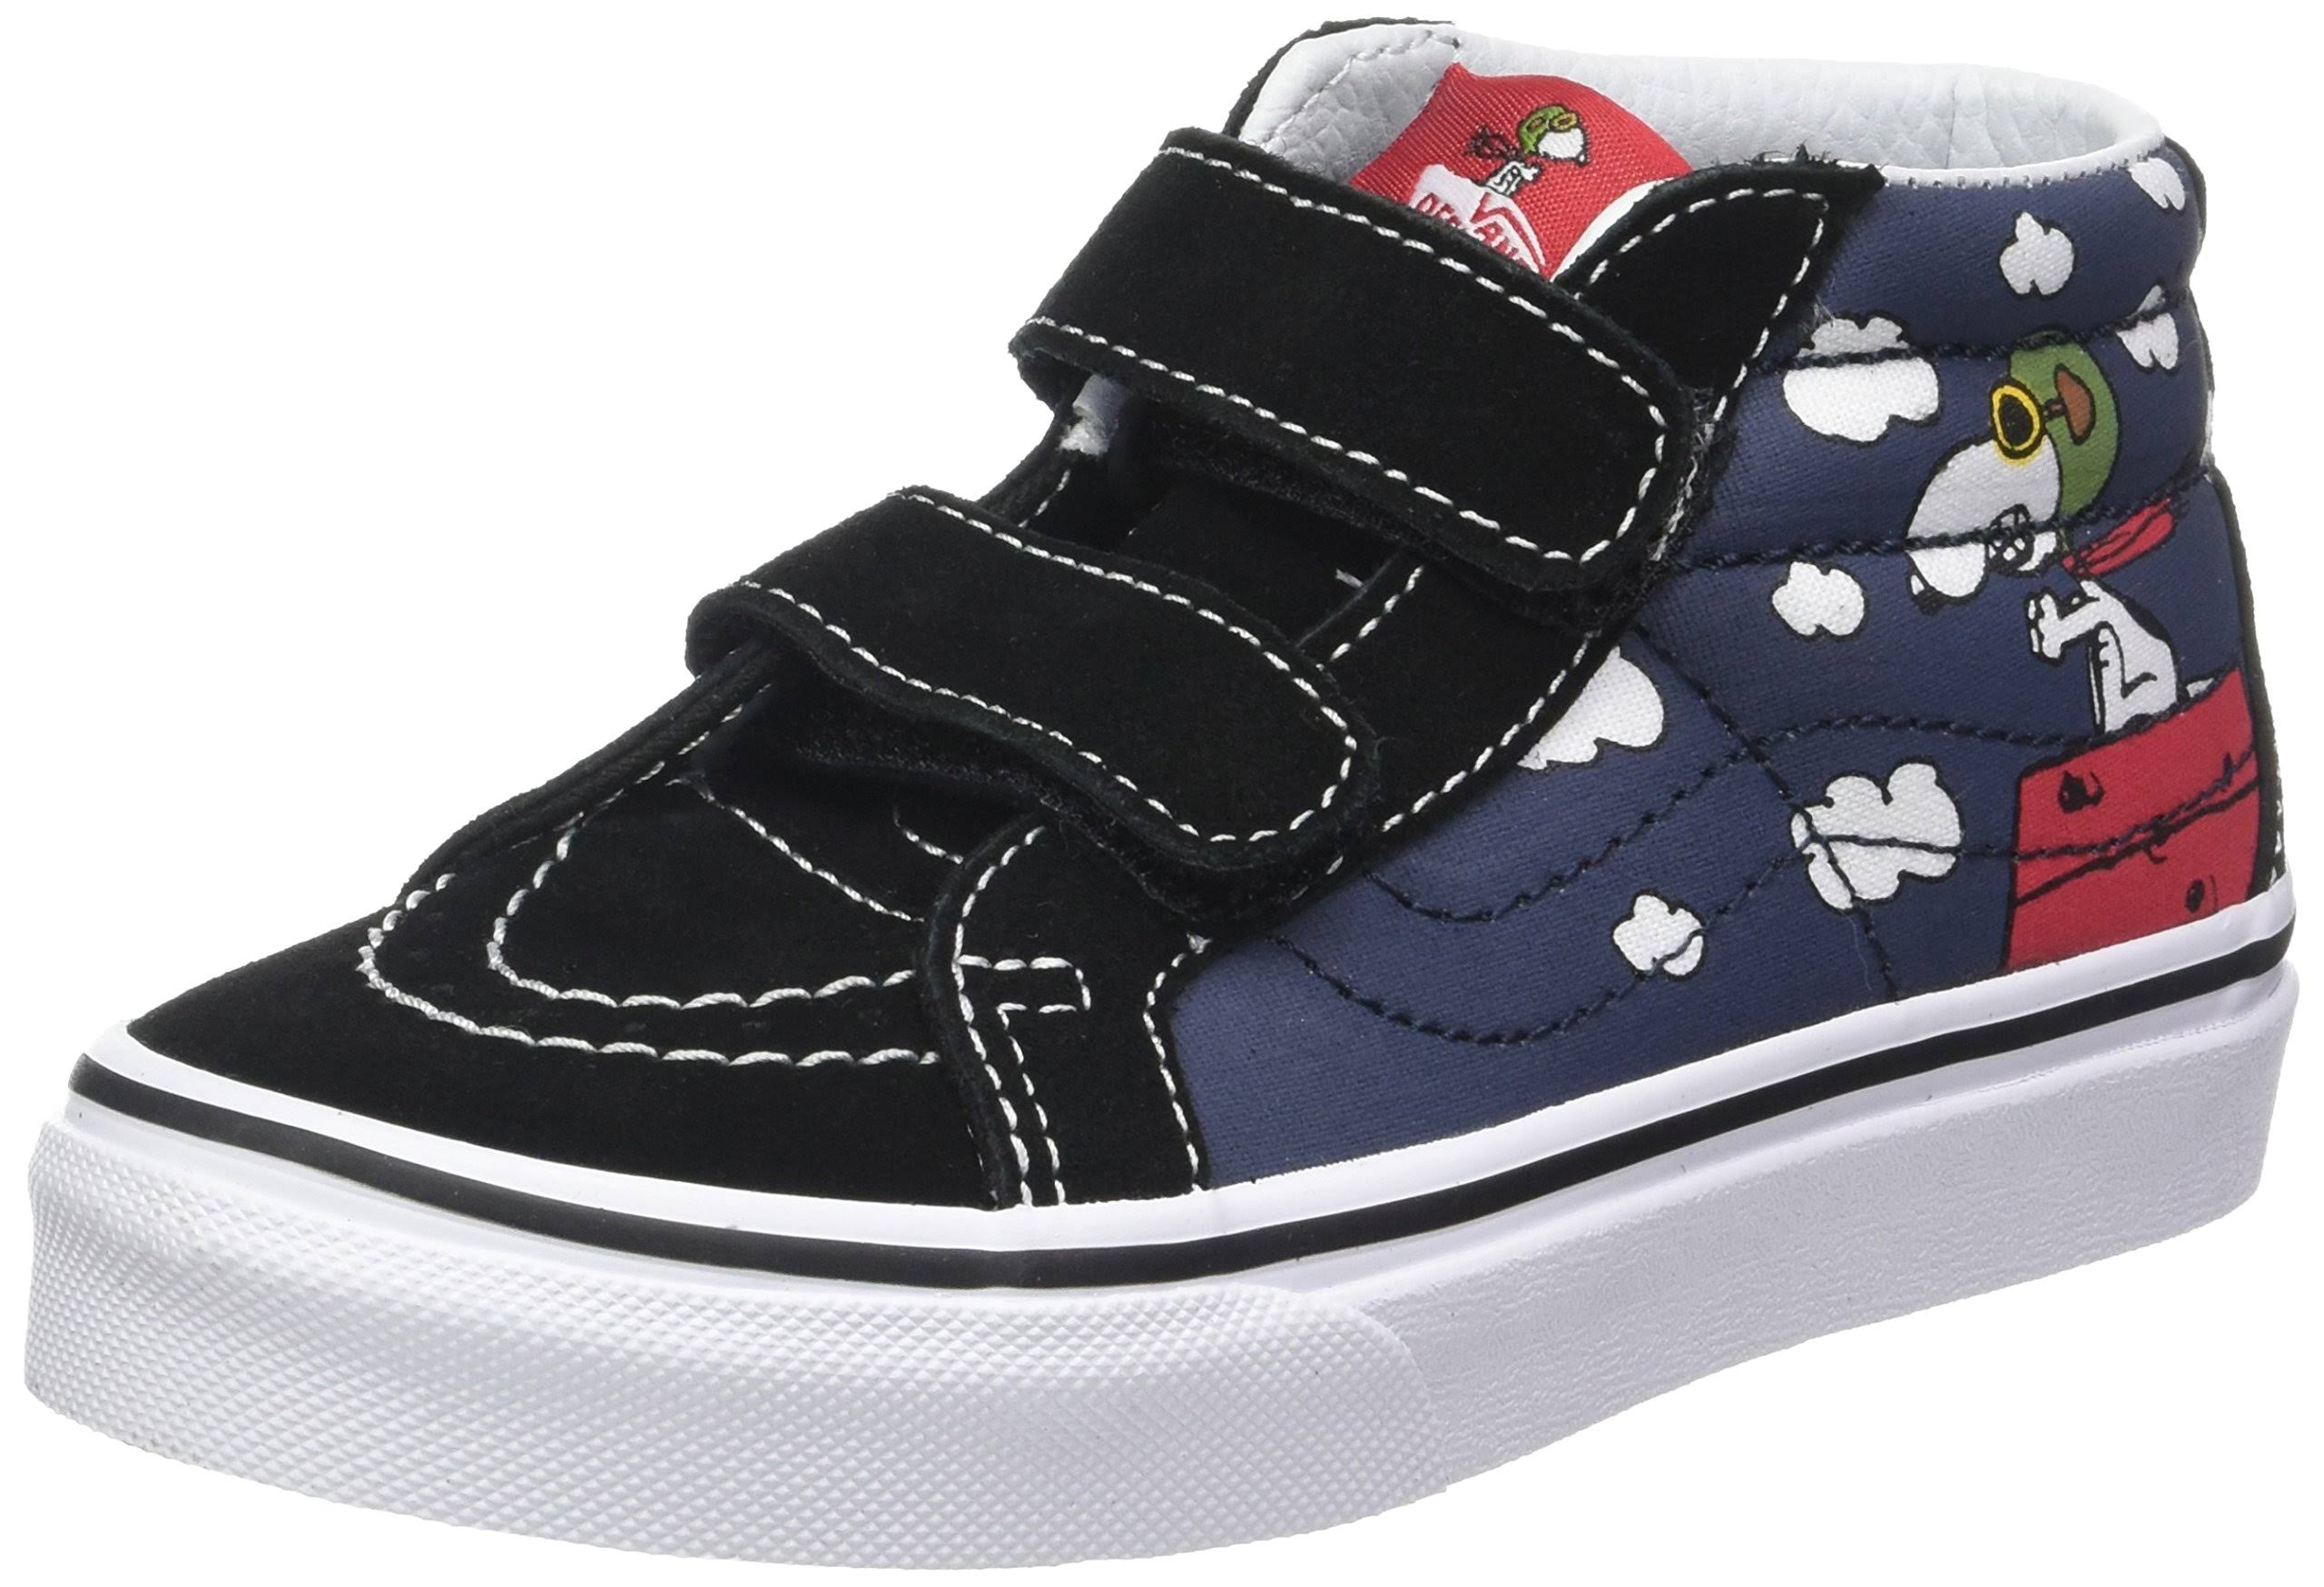 Vans Peanuts Blue Reissue Childrens Dress Flying Mid Sk8 Ace rxSr8WnI